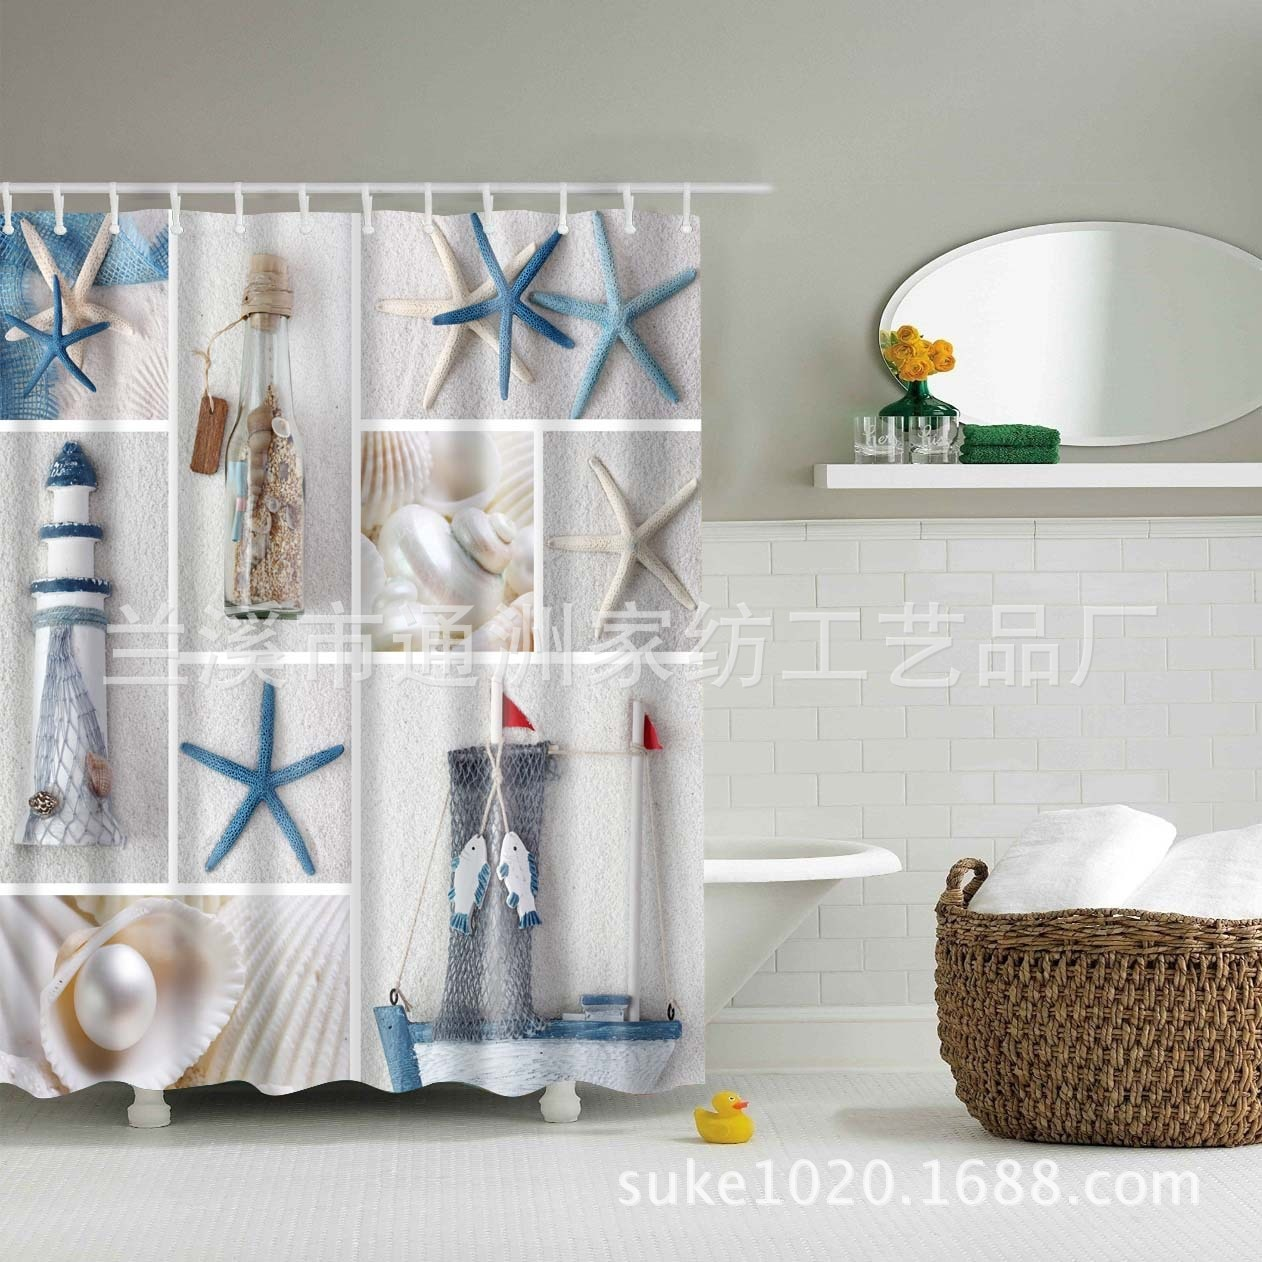 Cortina de ducha Floral transparente y gris, Cortina de ducha lavable natural,...